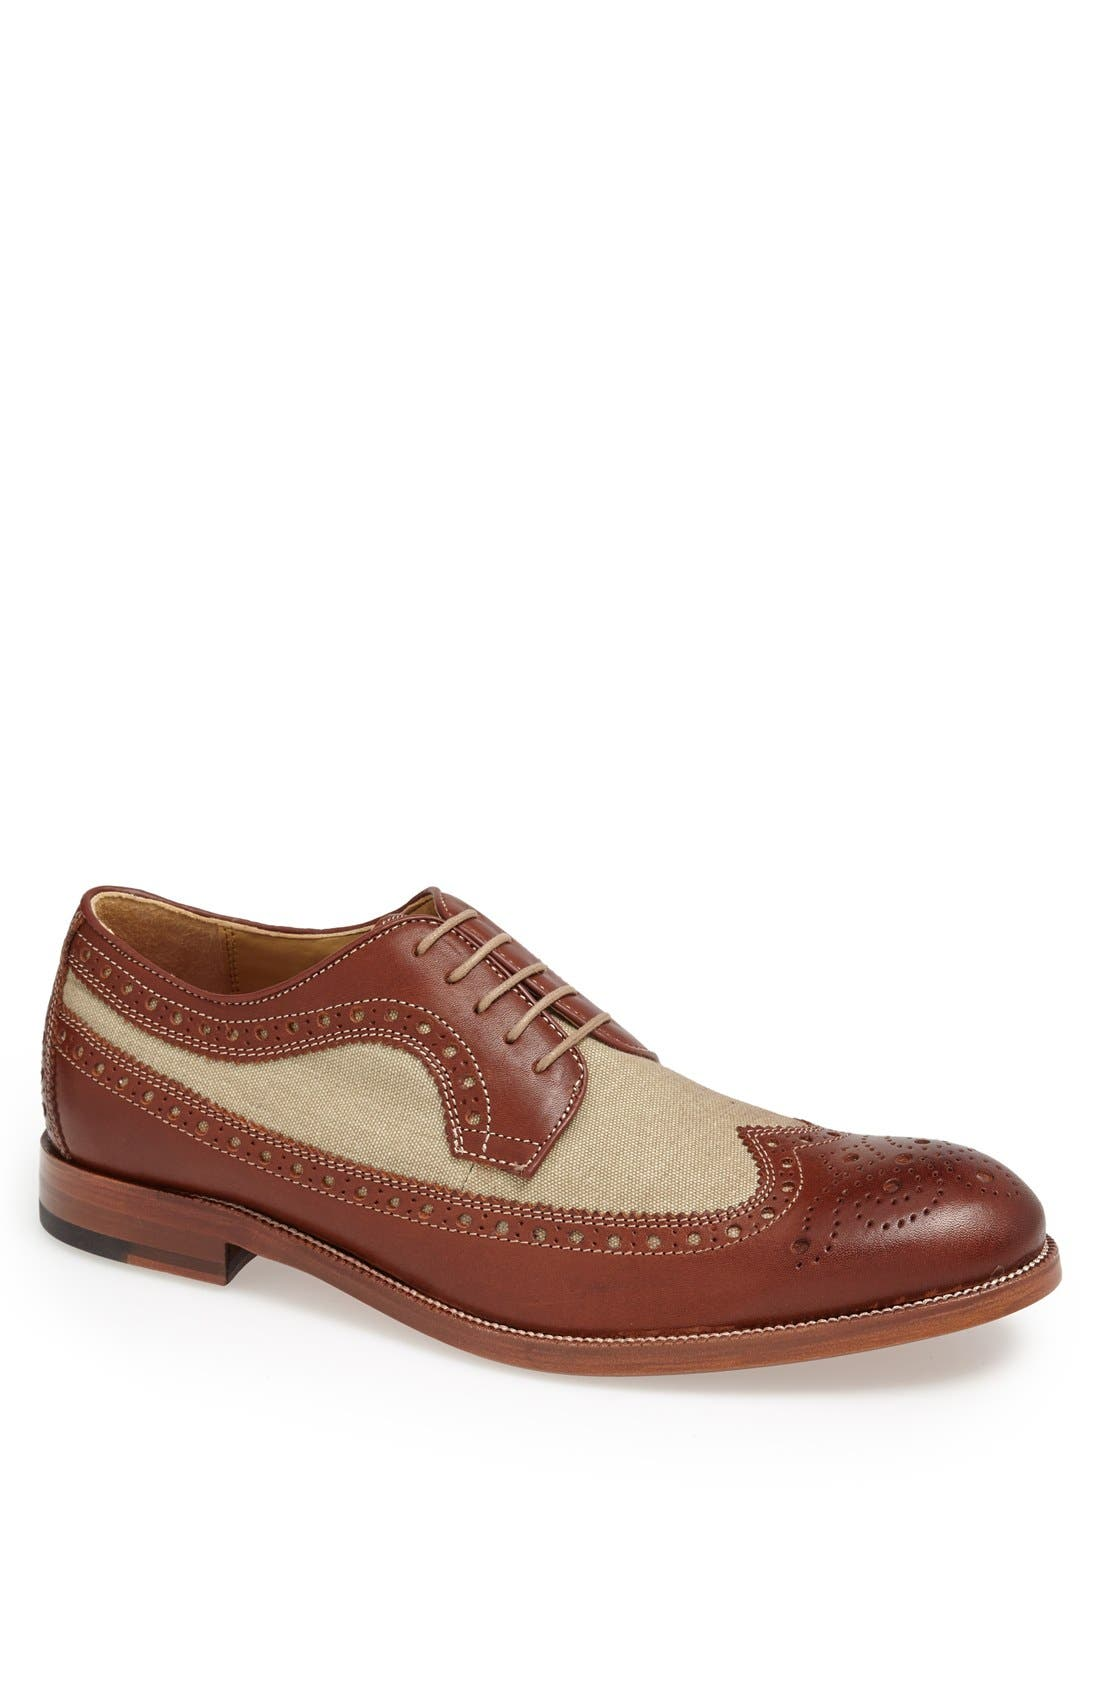 Alternate Image 1 Selected - Johnston & Murphy 'Clayton' Longwing Spectator Shoe (Online Only)